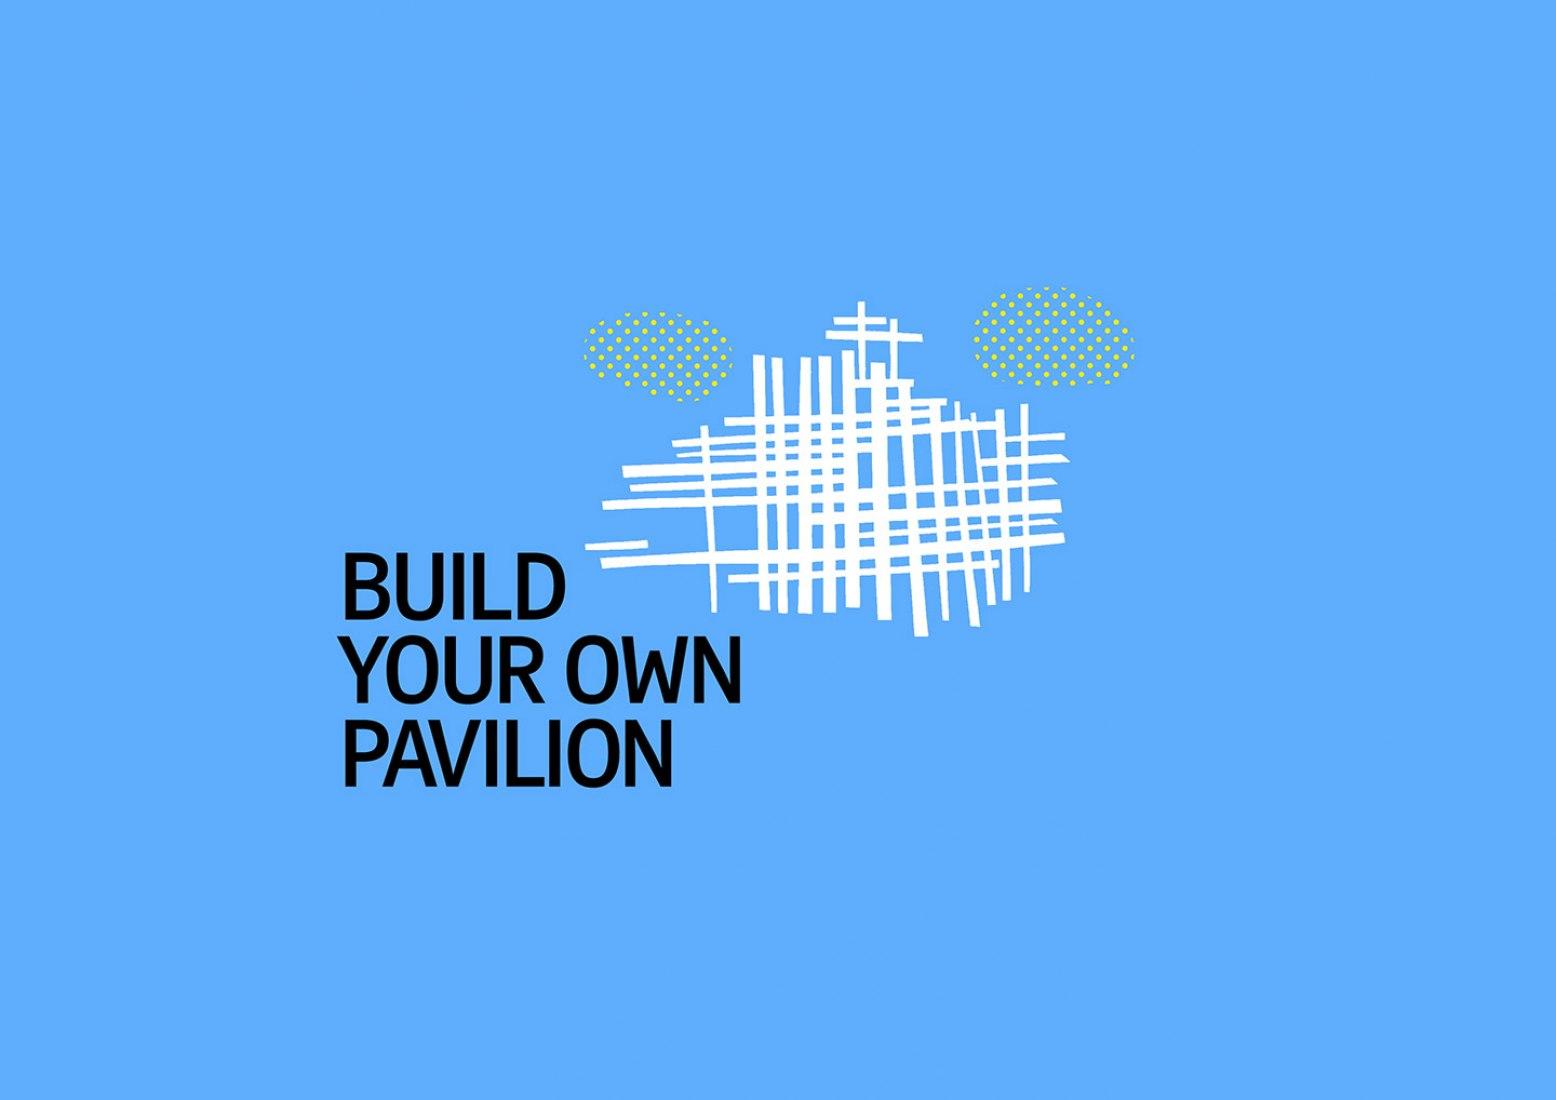 Poster. Program: Build Your Own Pavilion. The Serpentine Pavilion by Bjarke Ingels.